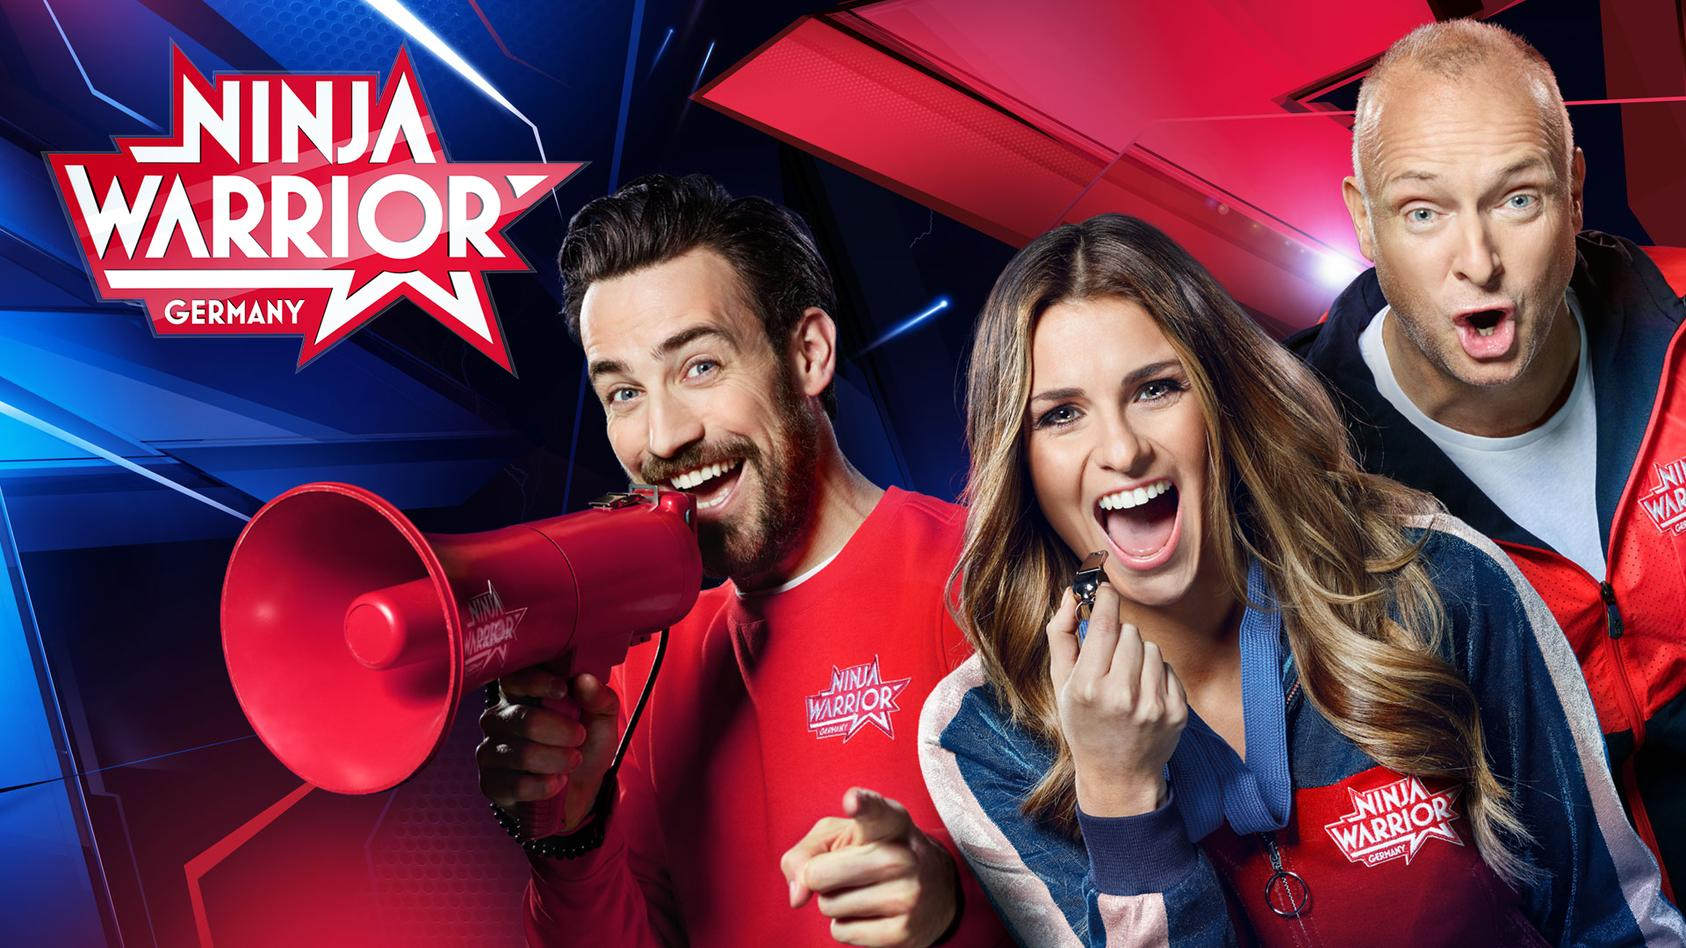 Samstag 20:15 Uhr, Ninja Warrior Germany - Staffel 6 - Wer wird Germany's Next Ninja Warrior?